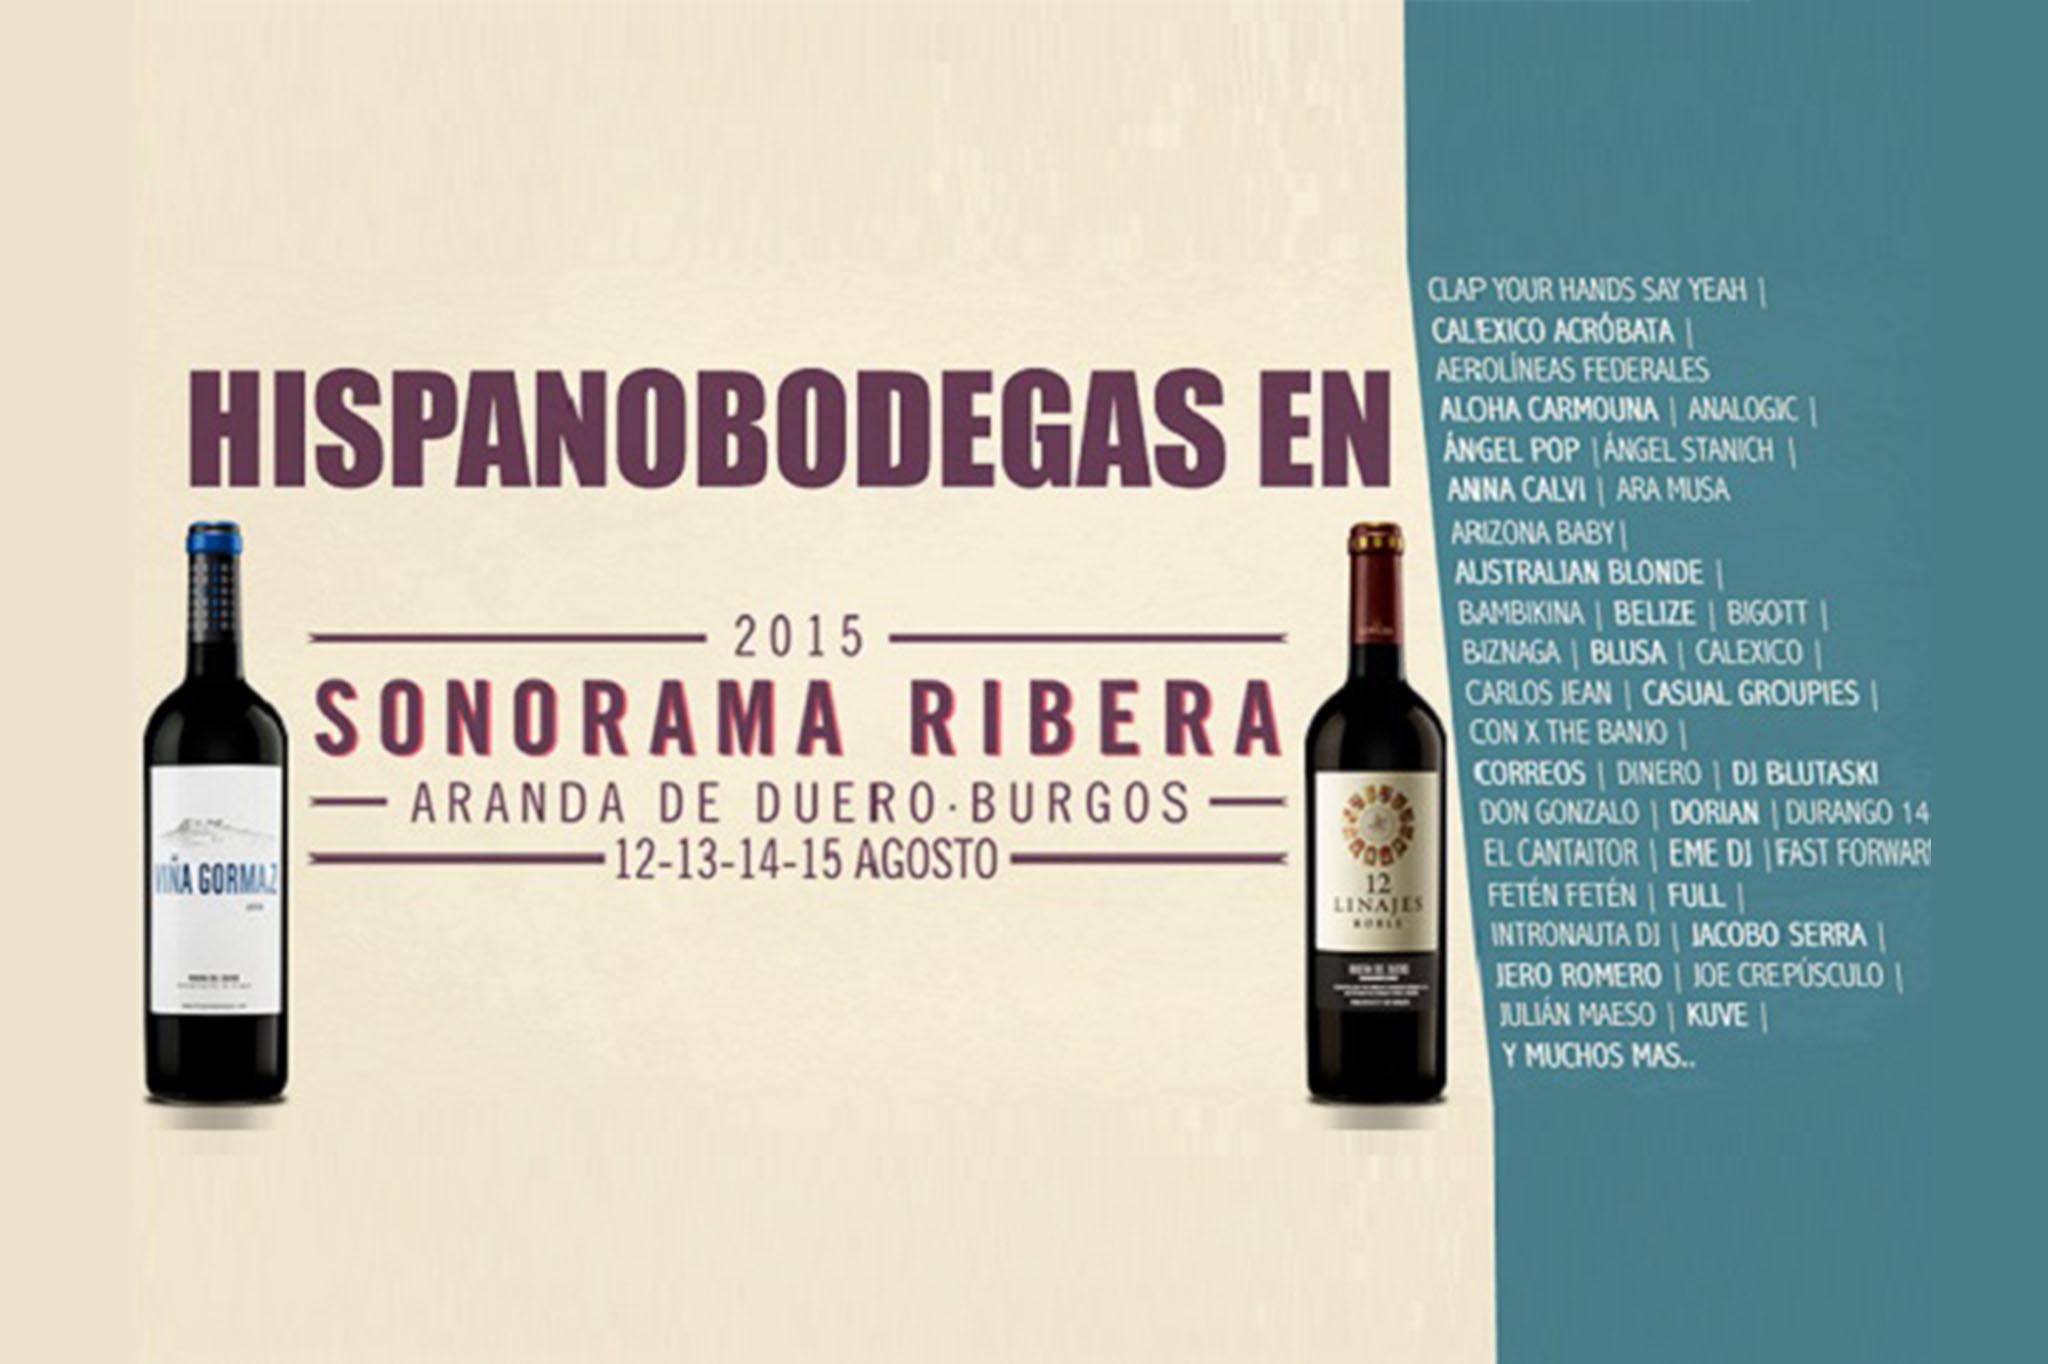 Hispanobodegas, Present at Sonorama Festival 2015